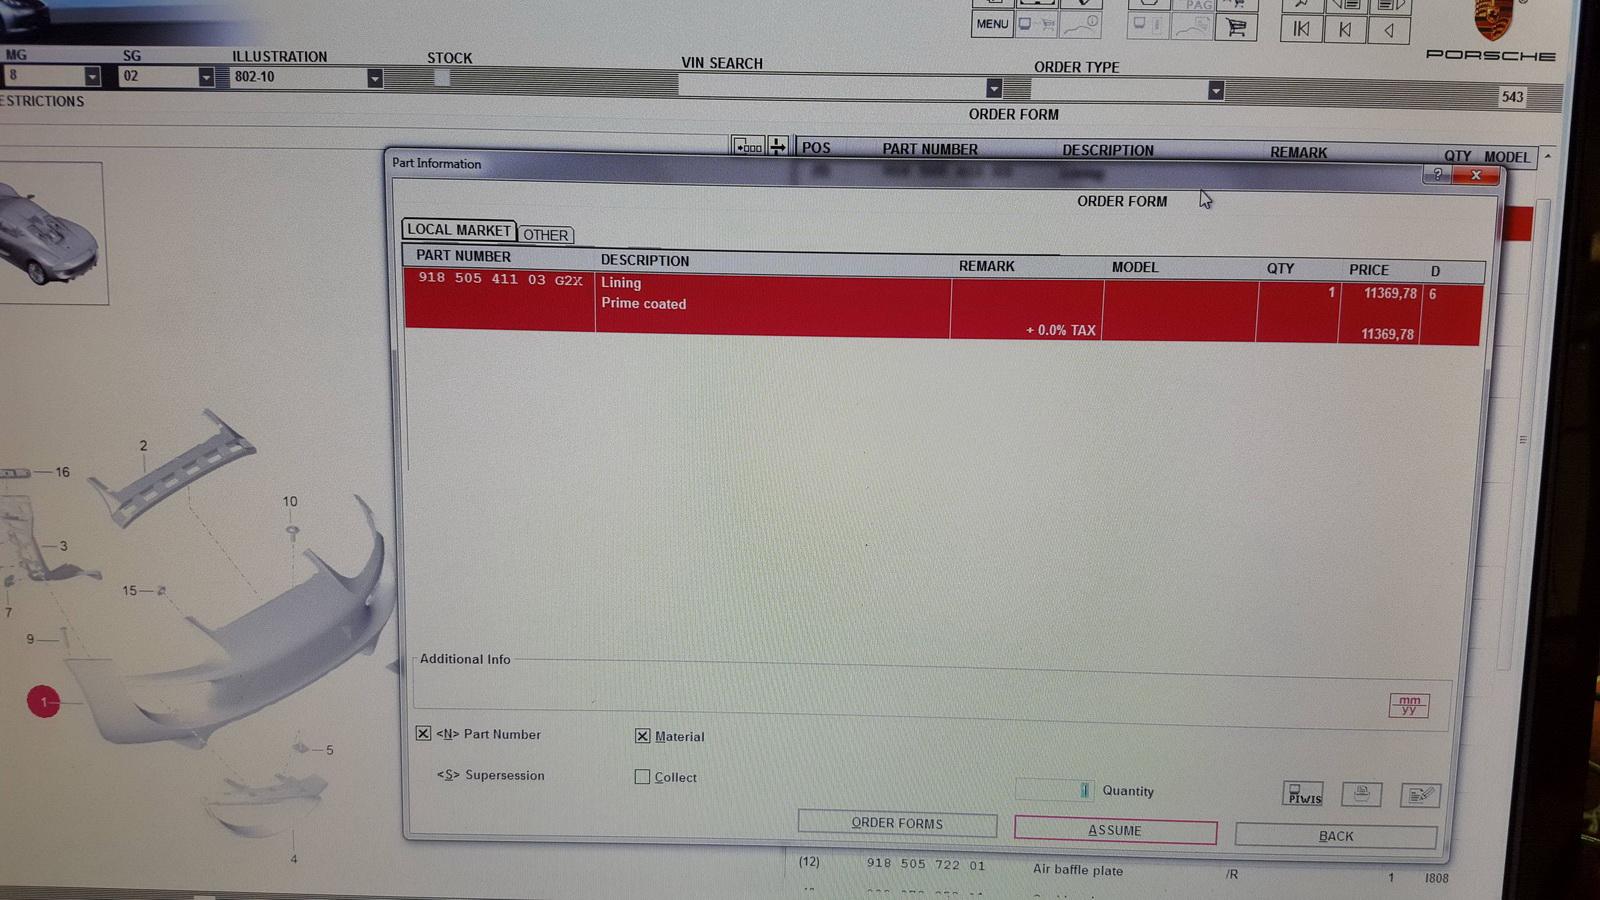 porsche 918 parts pricelist revealed it s eye watering engine photo gallery